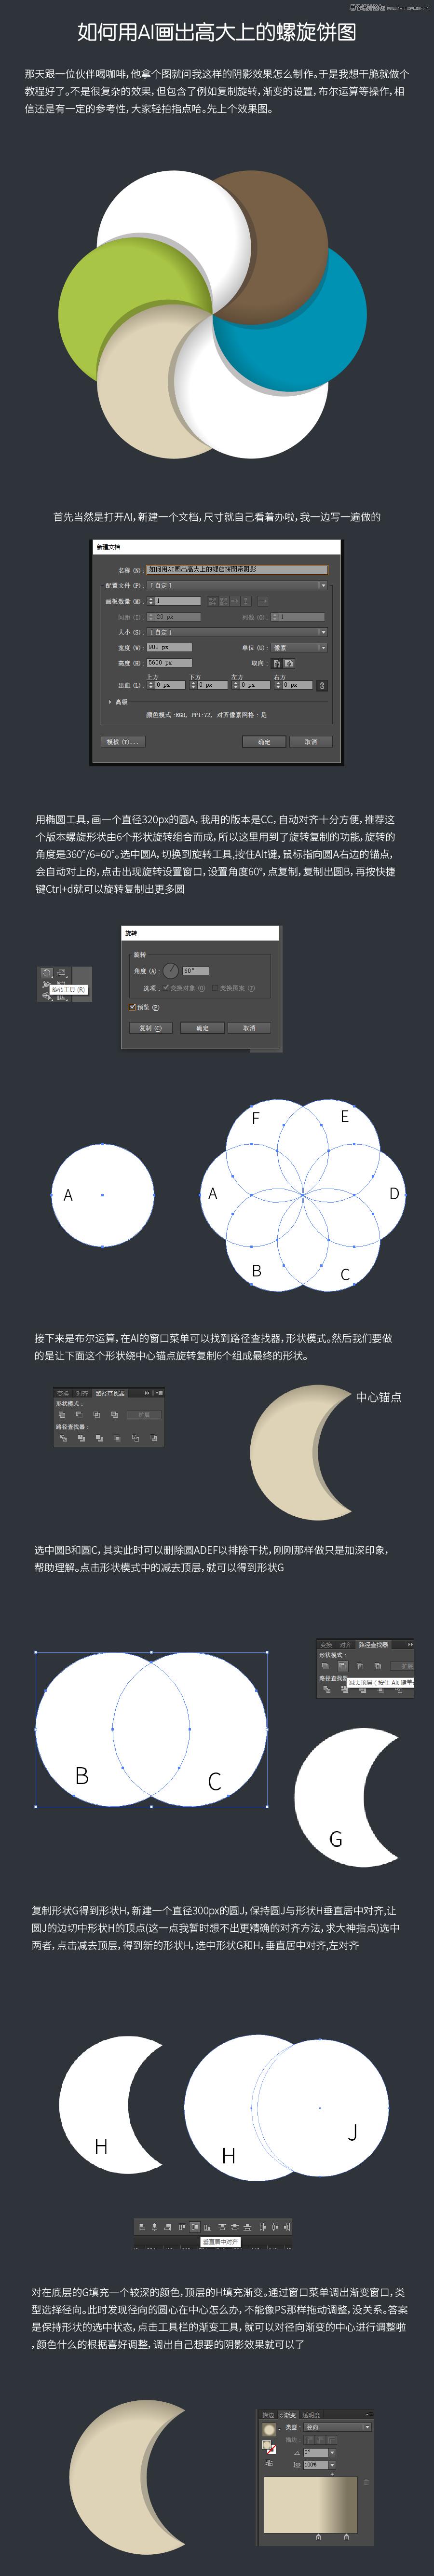 Illustrator绘制高大上的螺旋饼图效果